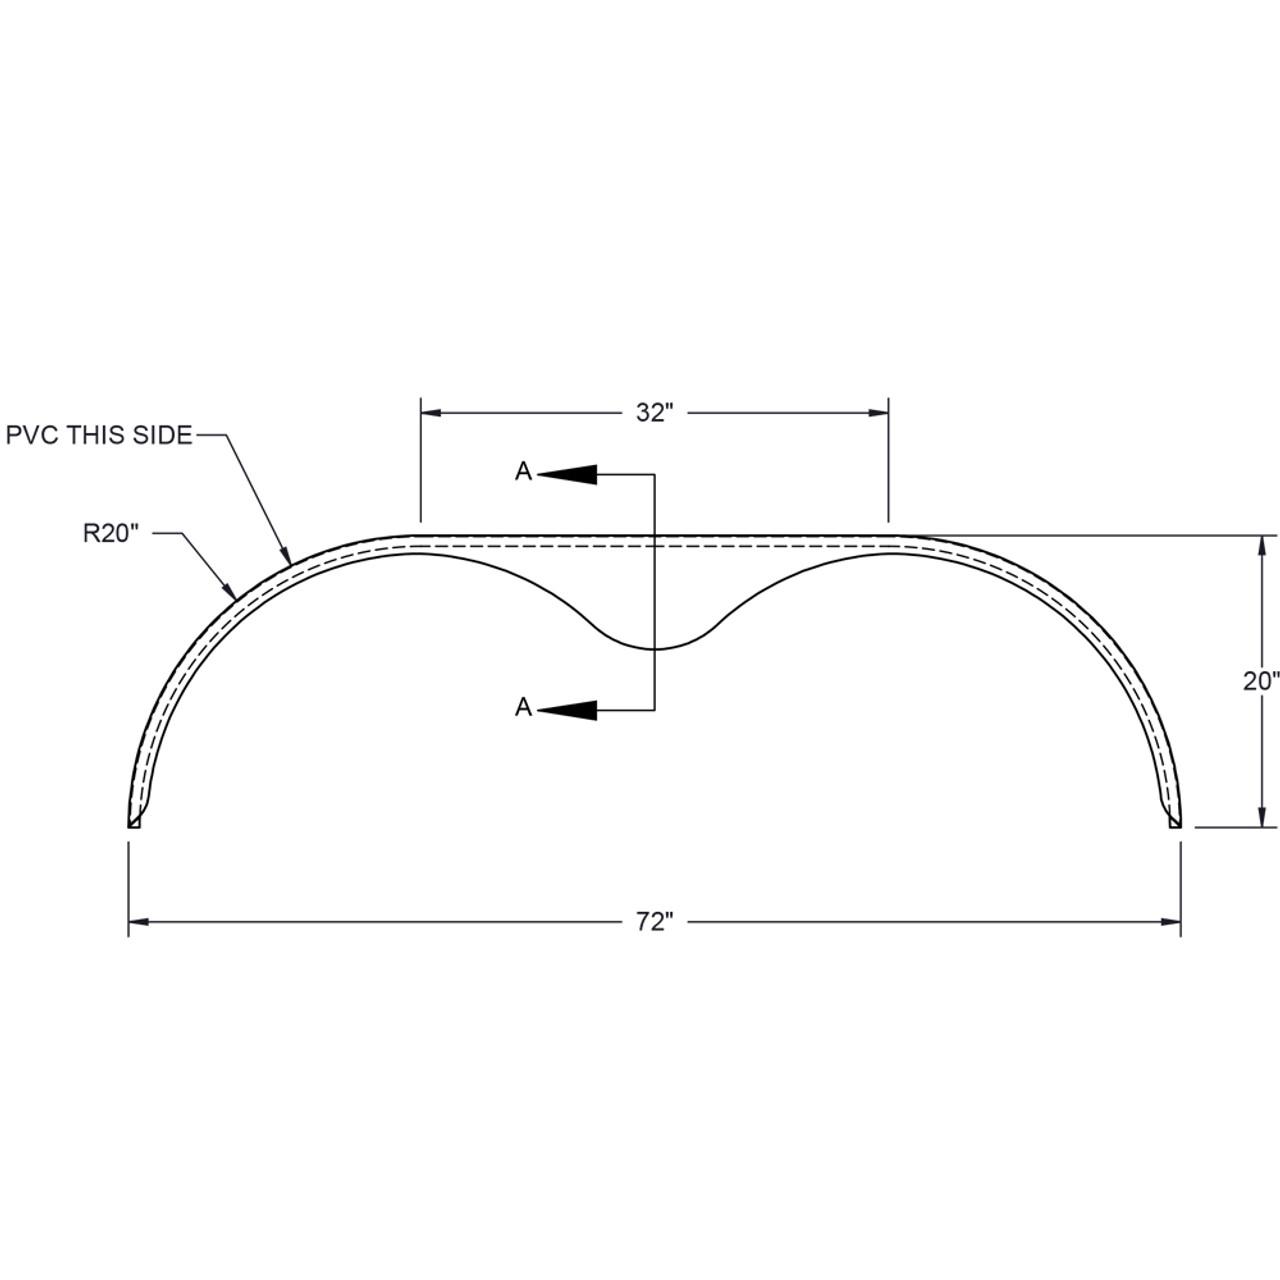 72x9 Aluminum Tread Plate Trailer Fender - Tandem Axle Teardrop - One Fender